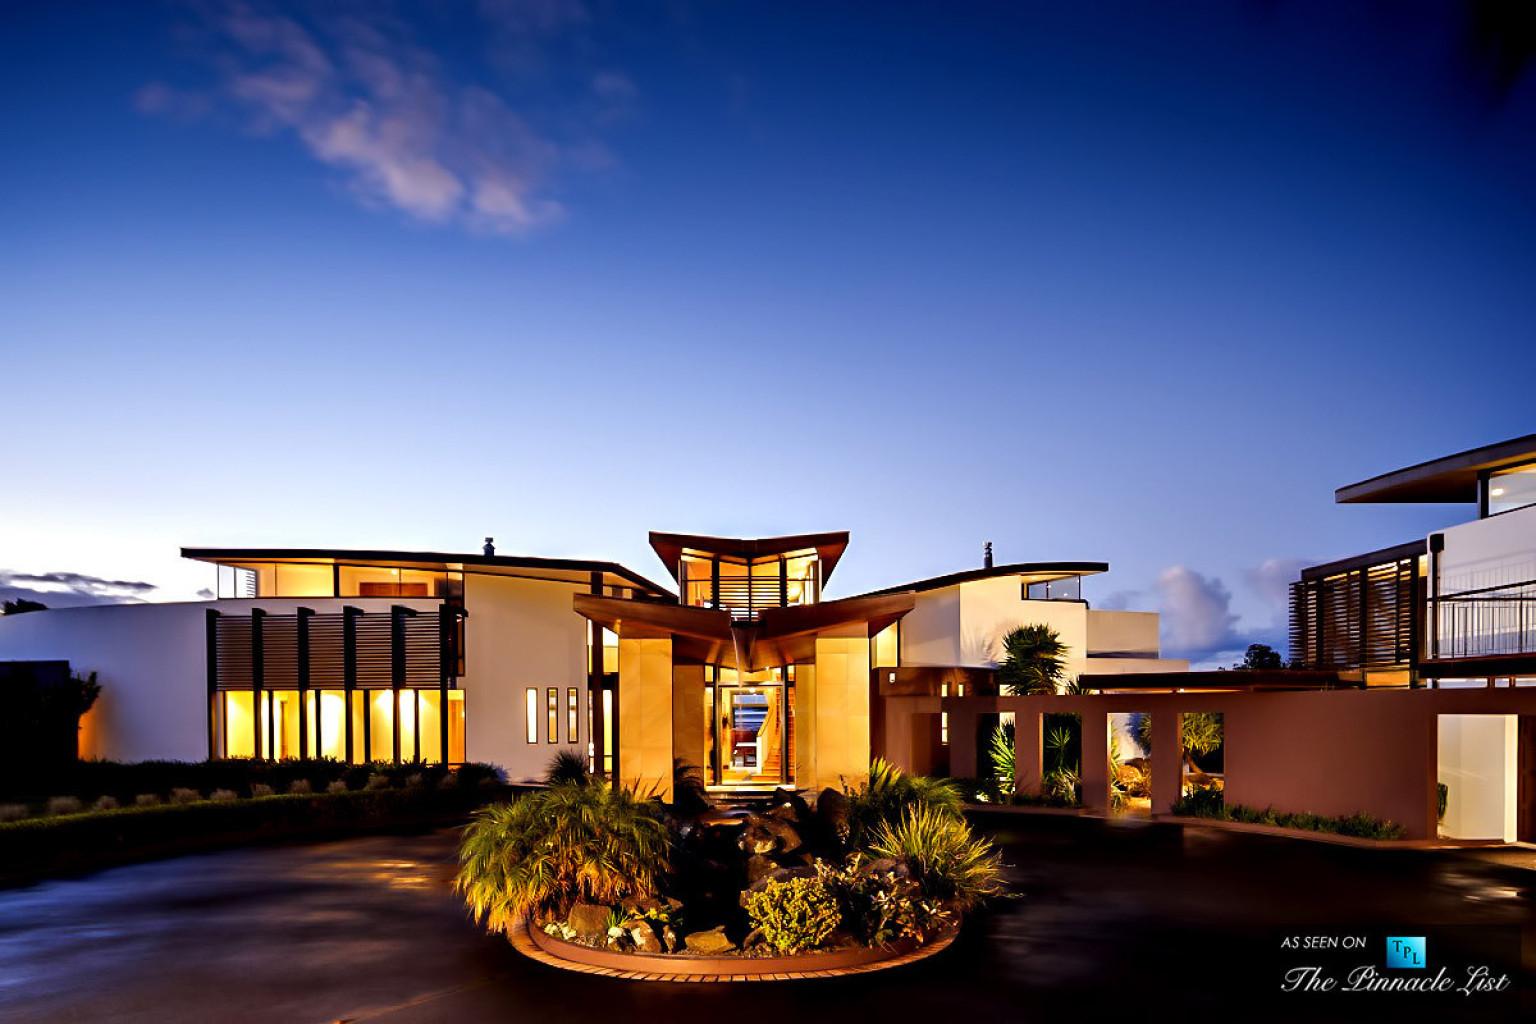 the stunning sullivan house residence in new zealand took